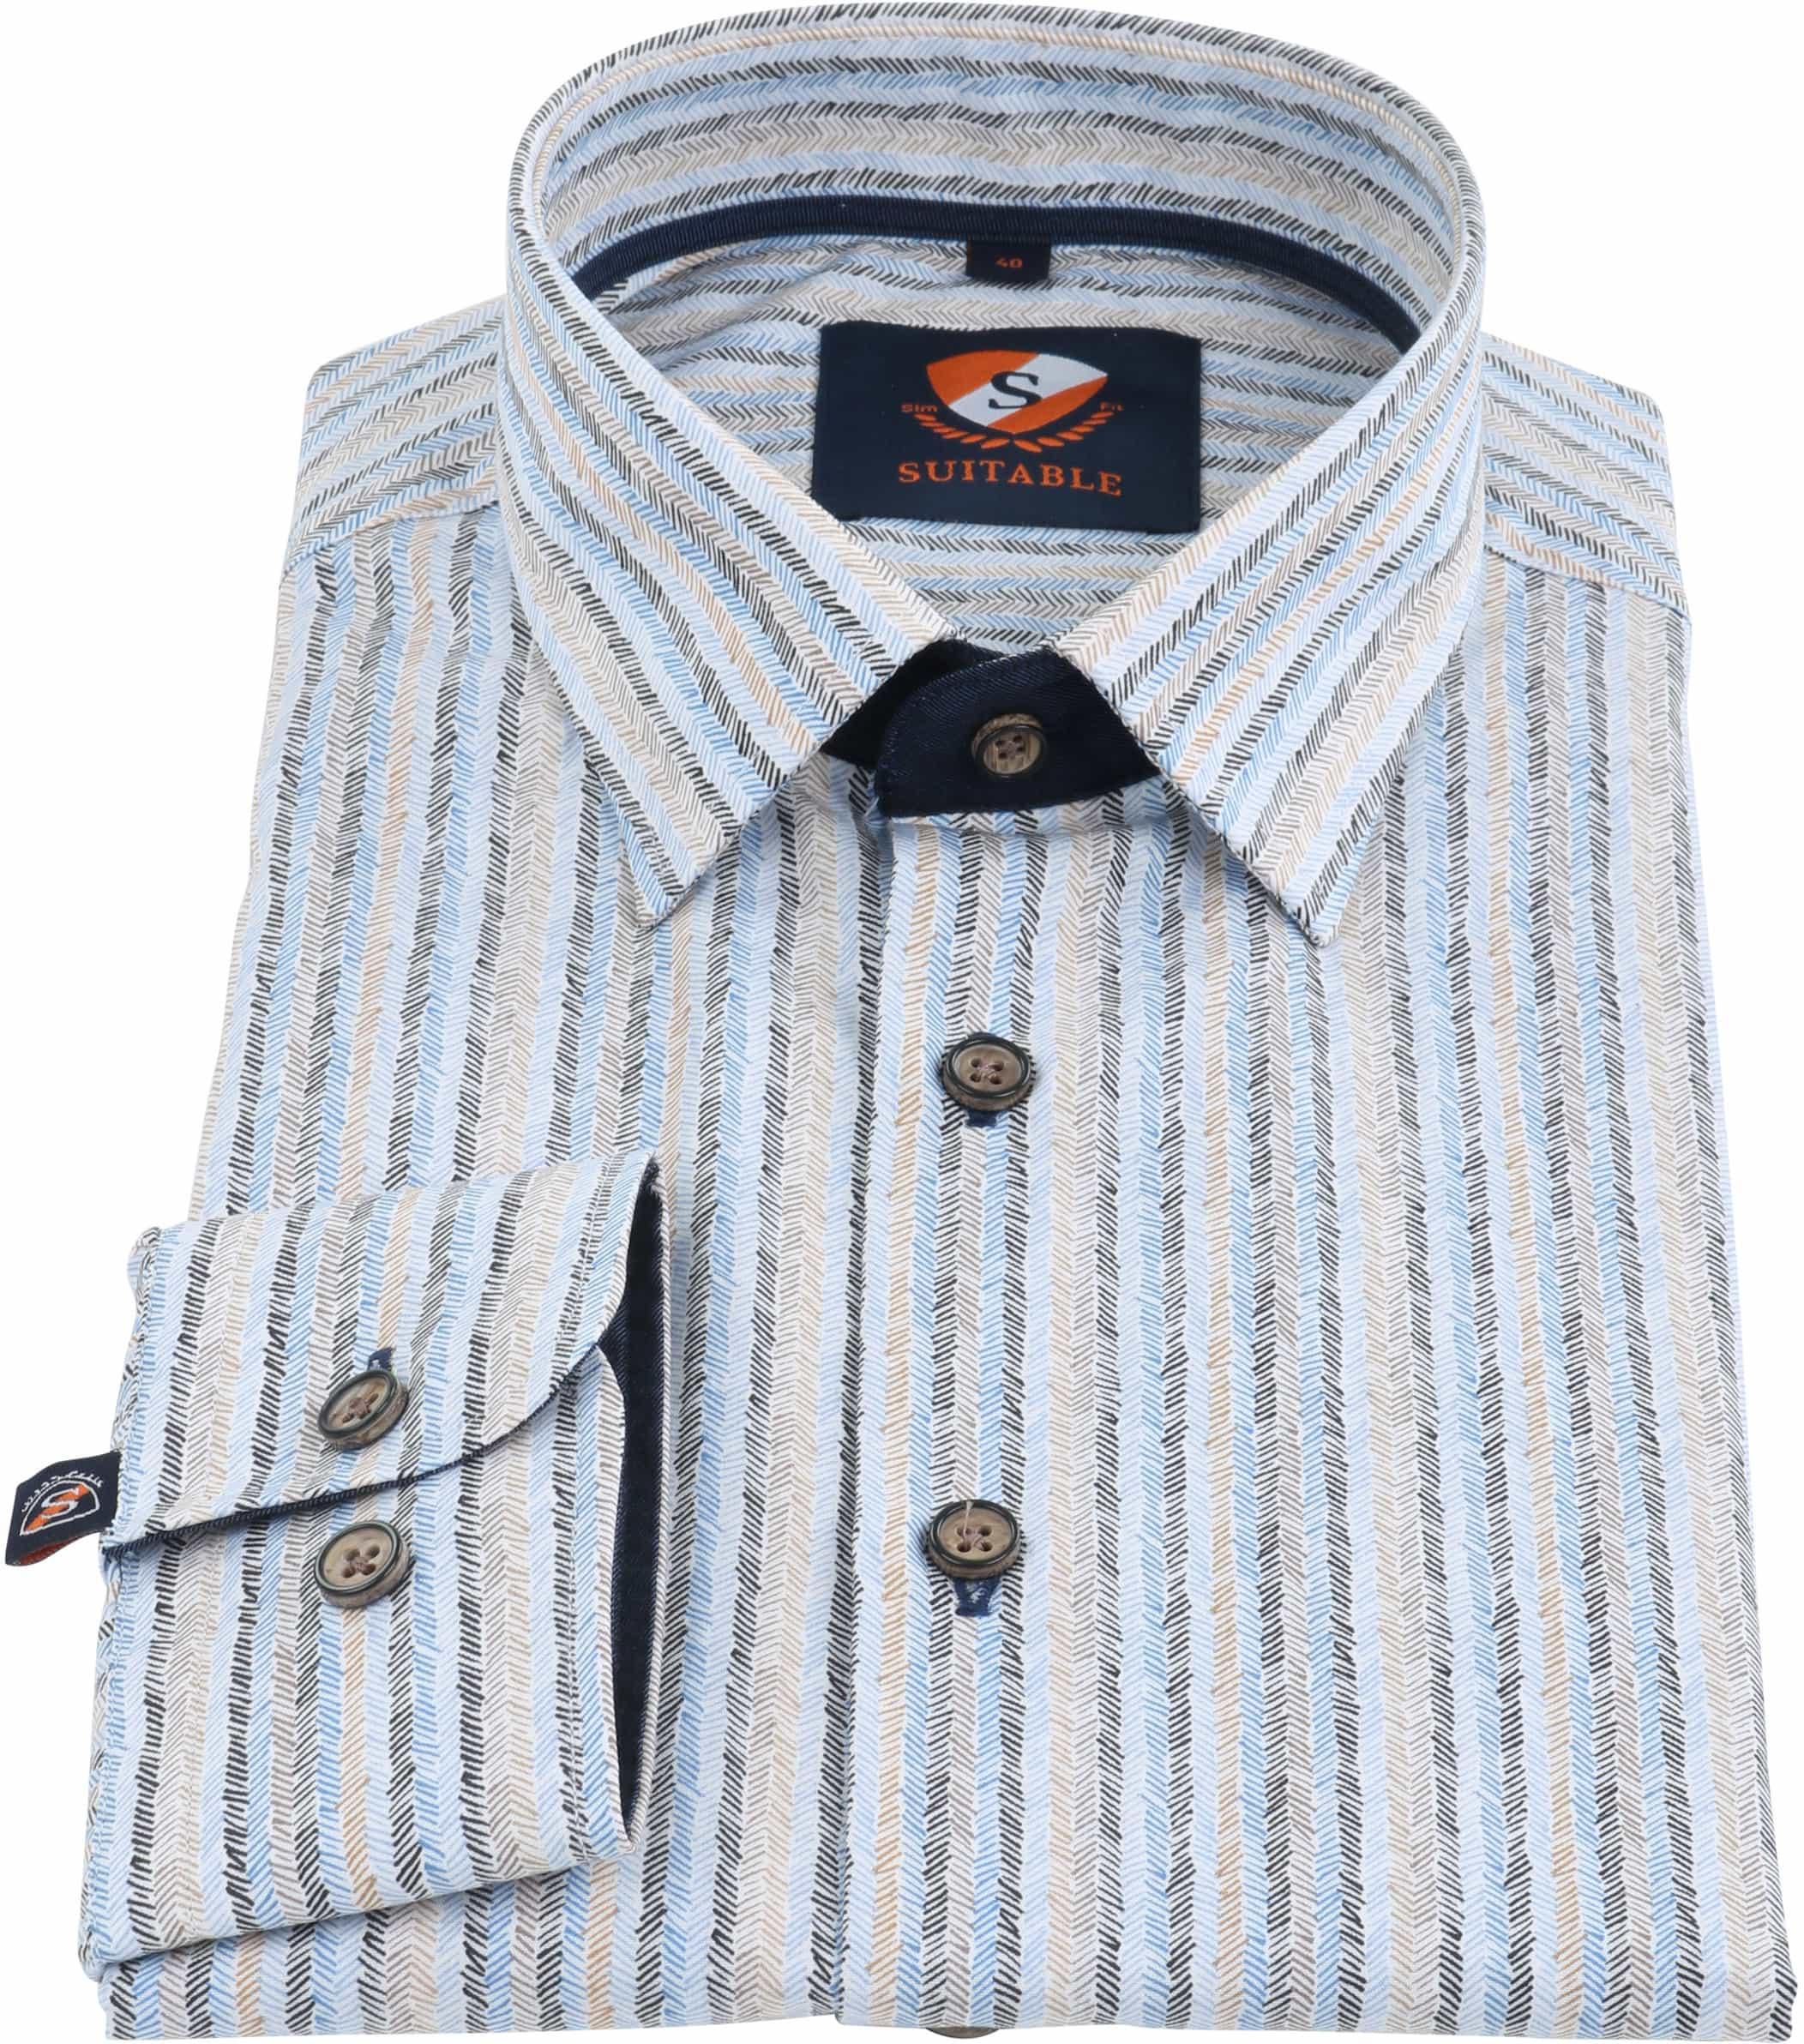 Suitable Overhemd Herring Print HBD foto 1